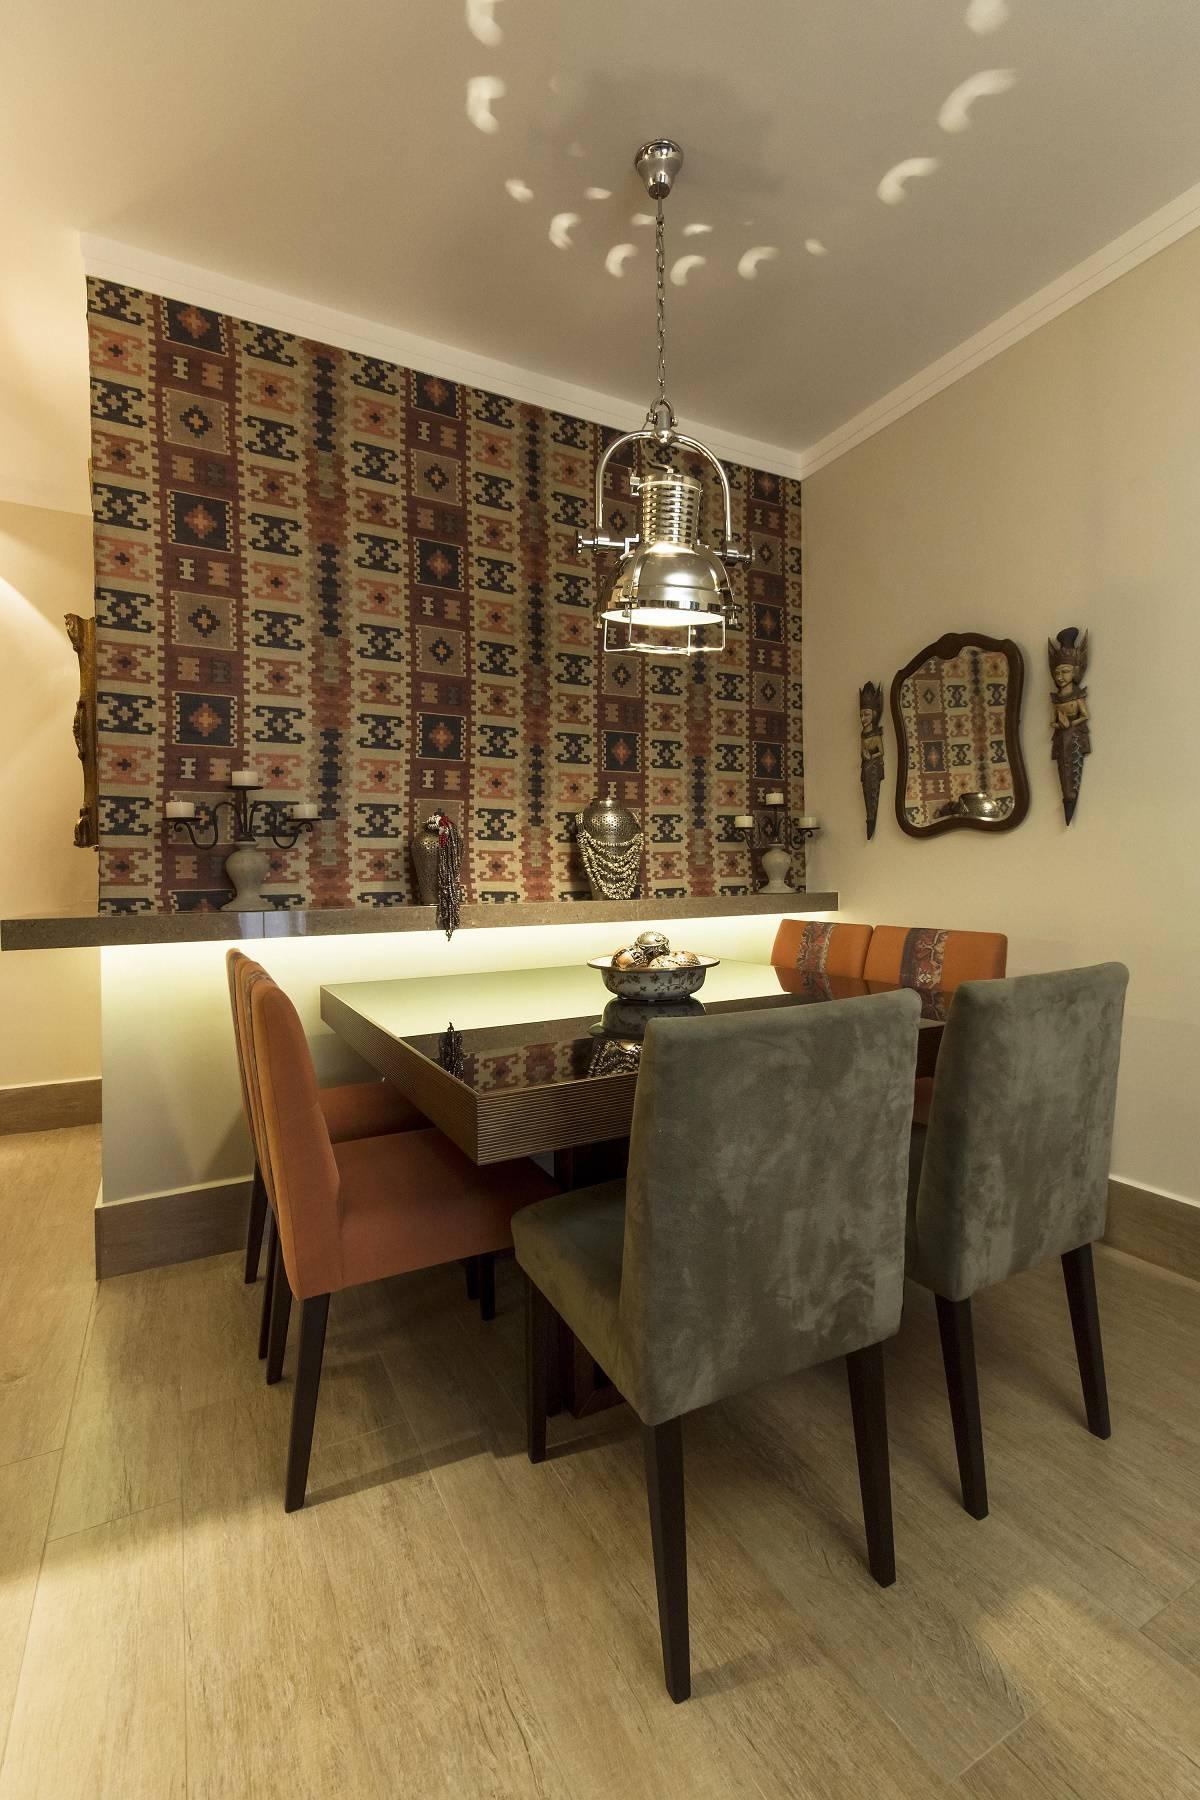 Papel De Parede Para Sala De Jantar Viva Decora -> Adesivos Decorativos Para Sala De Jantar